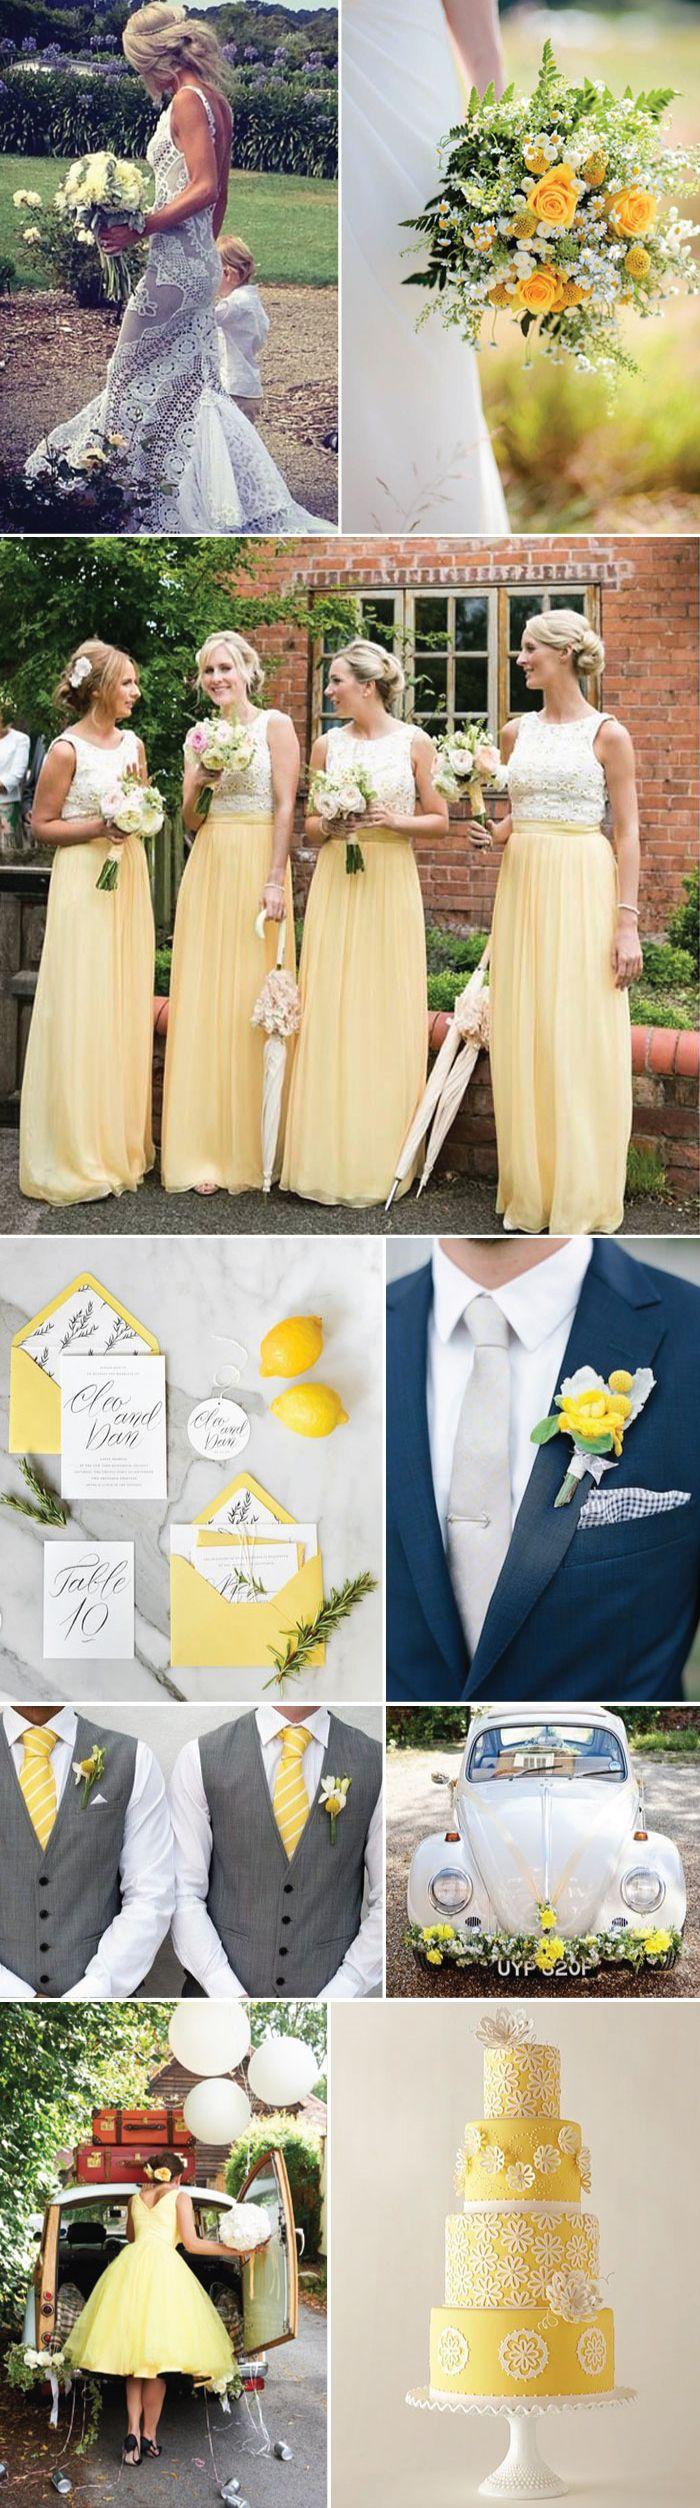 Wedding decorations yellow and gray   best Oh Ium wishing images on Pinterest  Wedding ideas Bridal